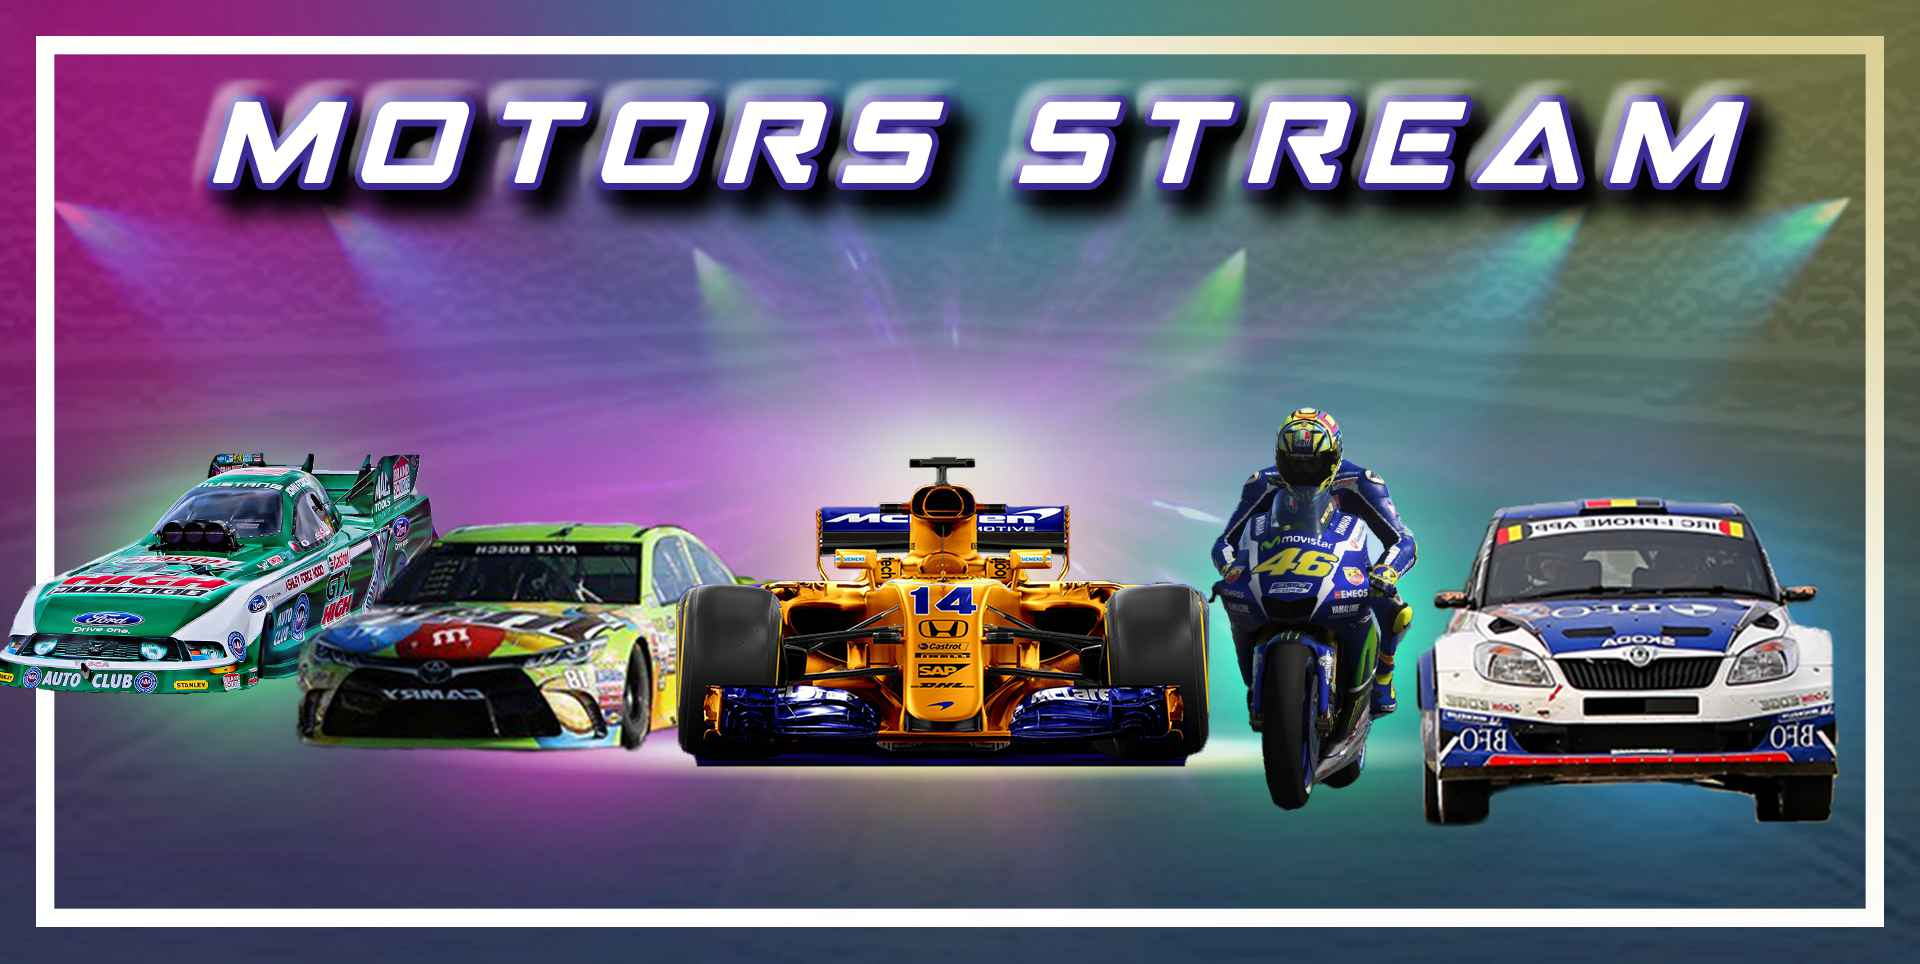 STP 500 NASCAR Series Event 2017 Result